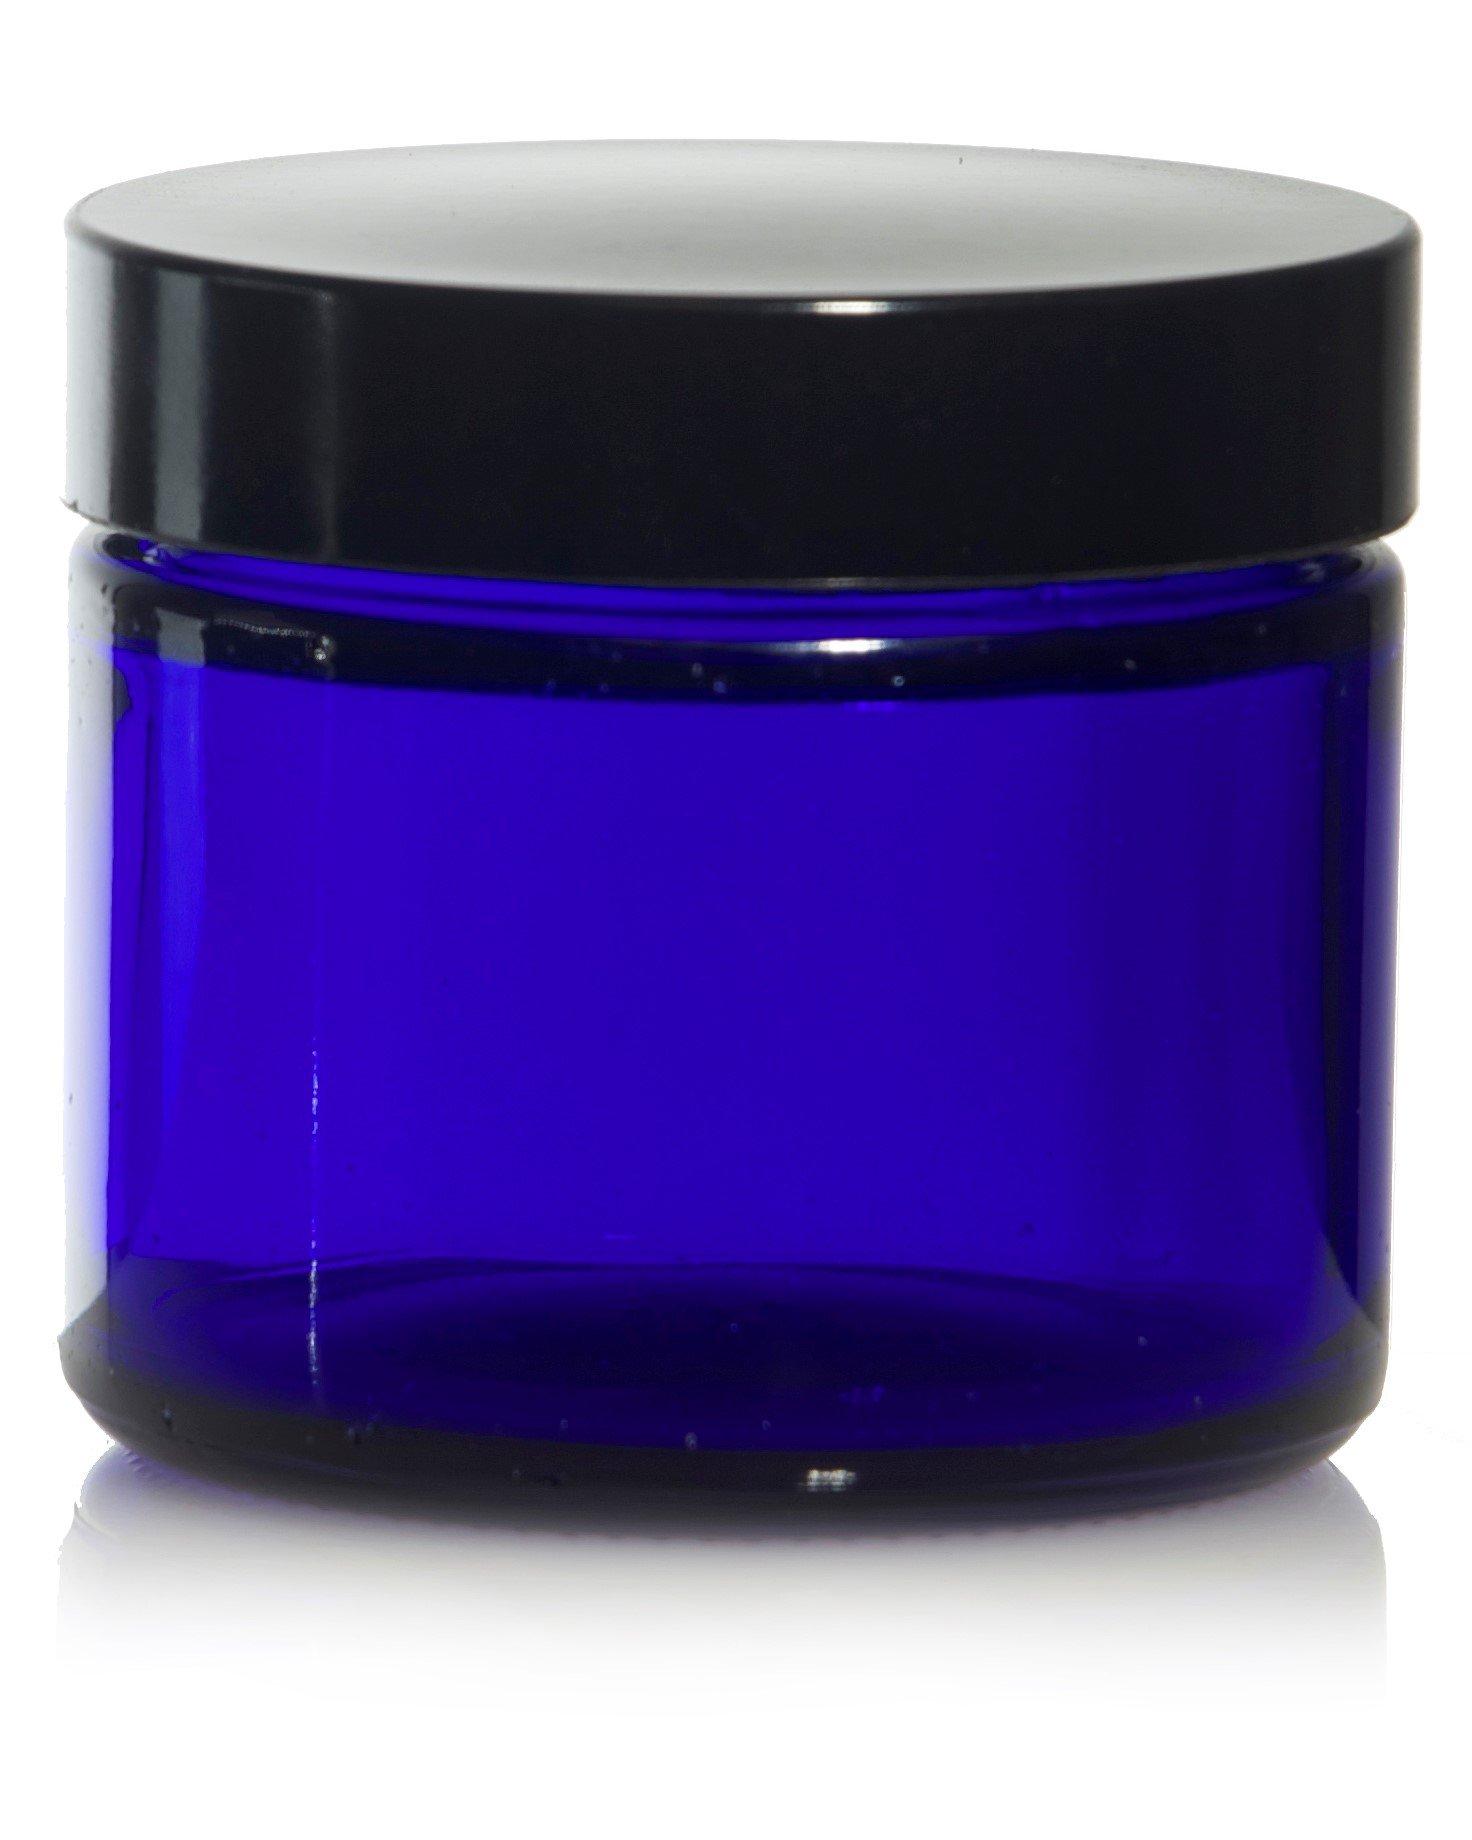 2 Oz ( 60 ml ) Blue Glass Jars w/ Black Smooth Foam lined Caps (144) by True Decor